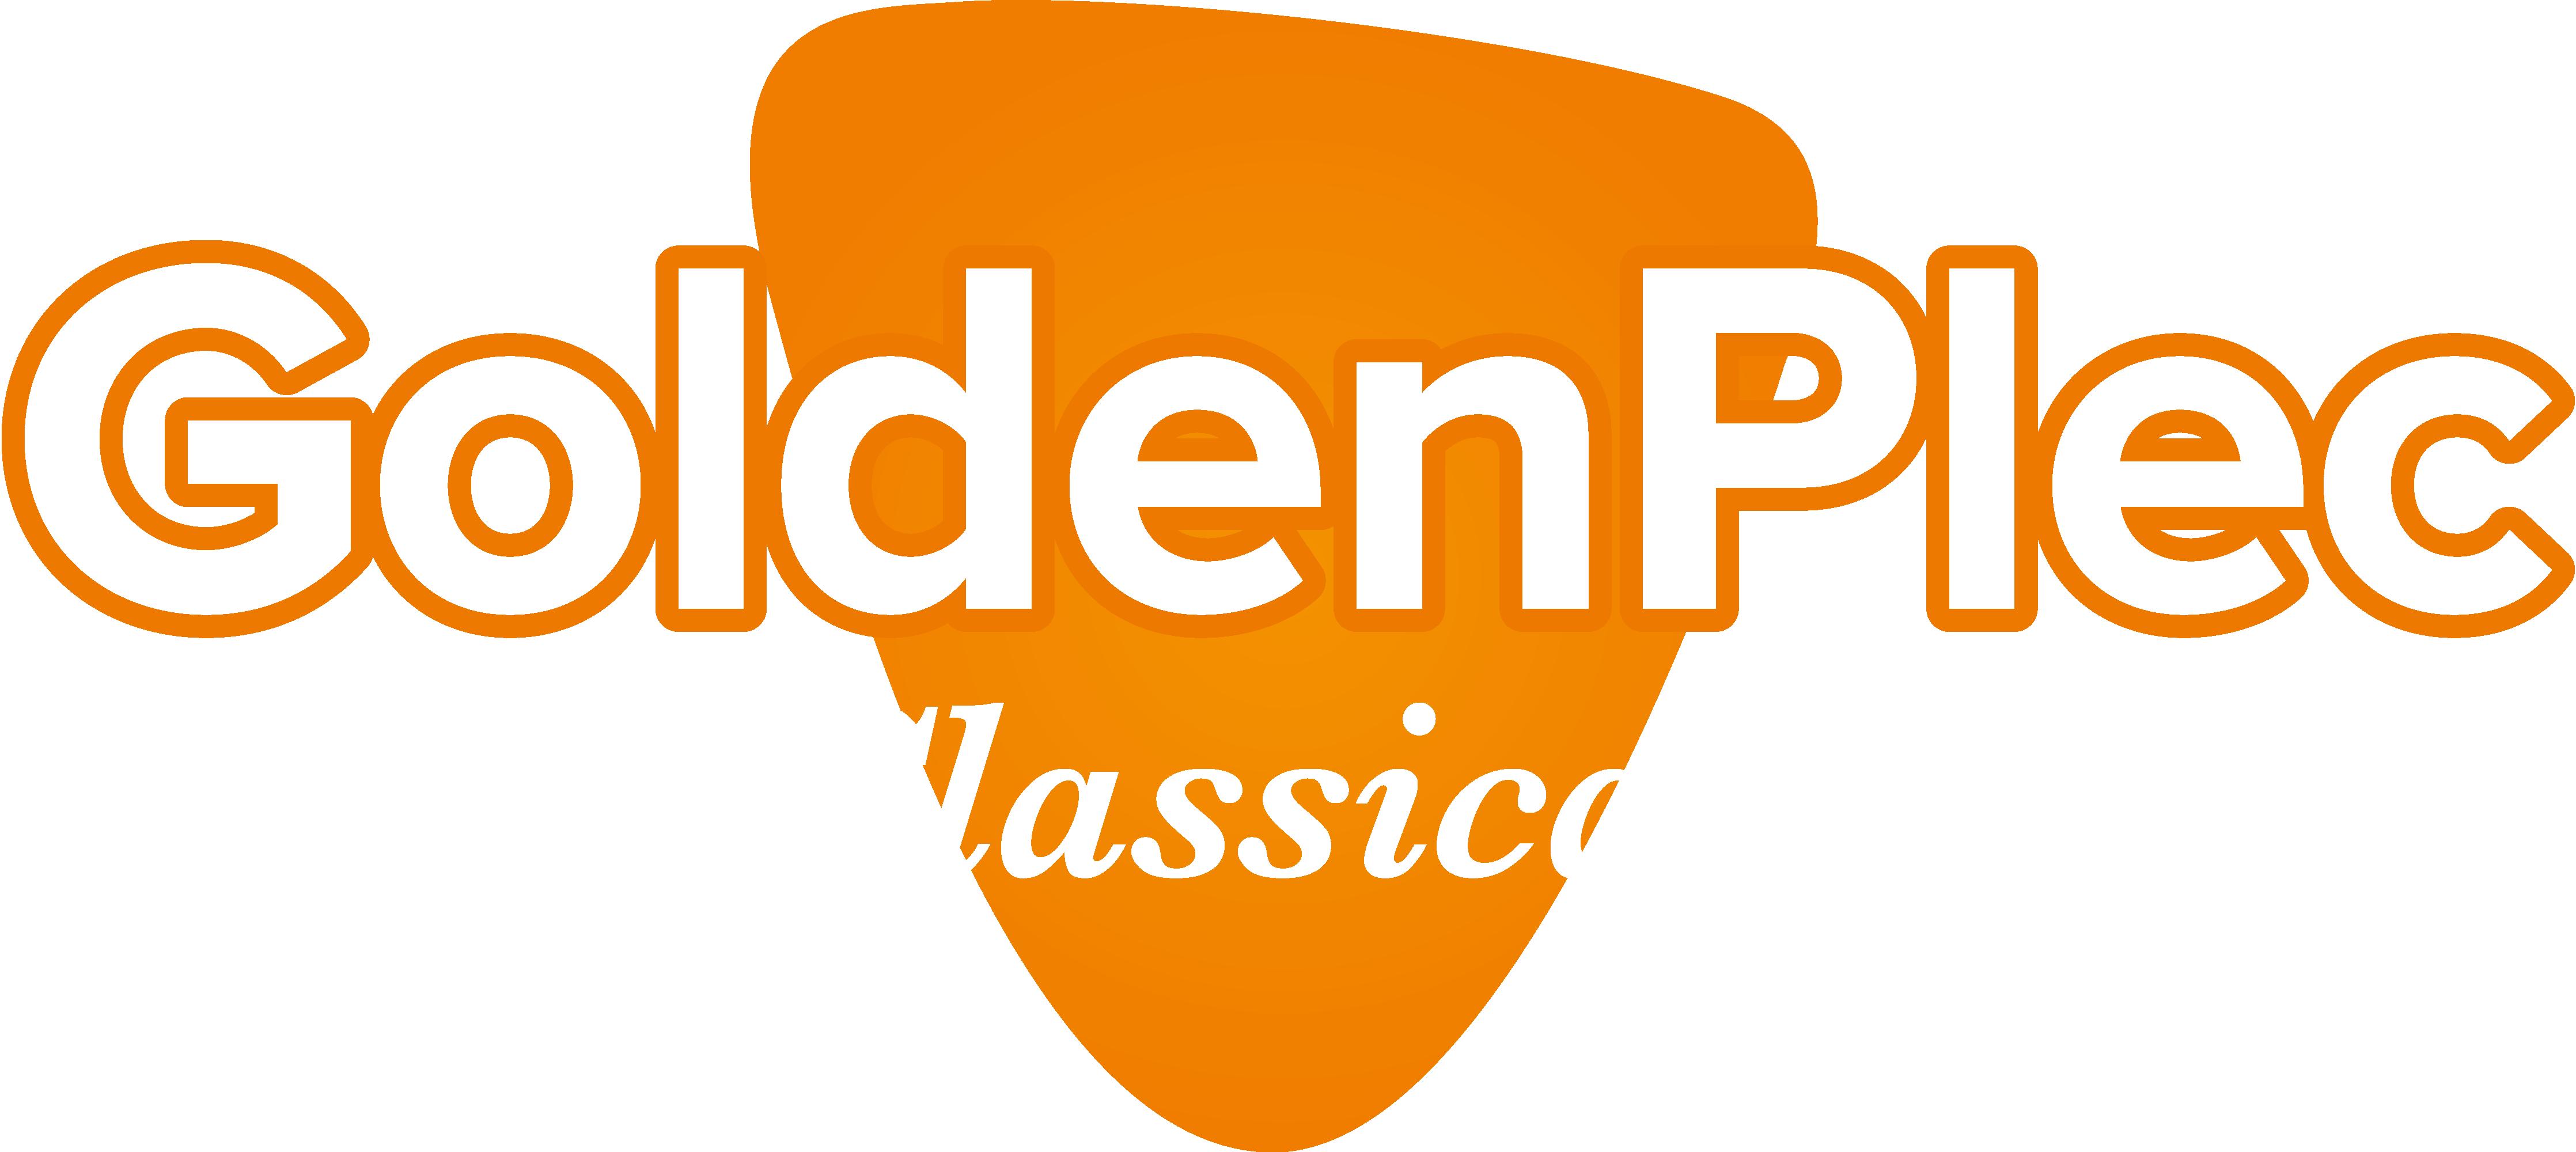 GoldenPlec logo